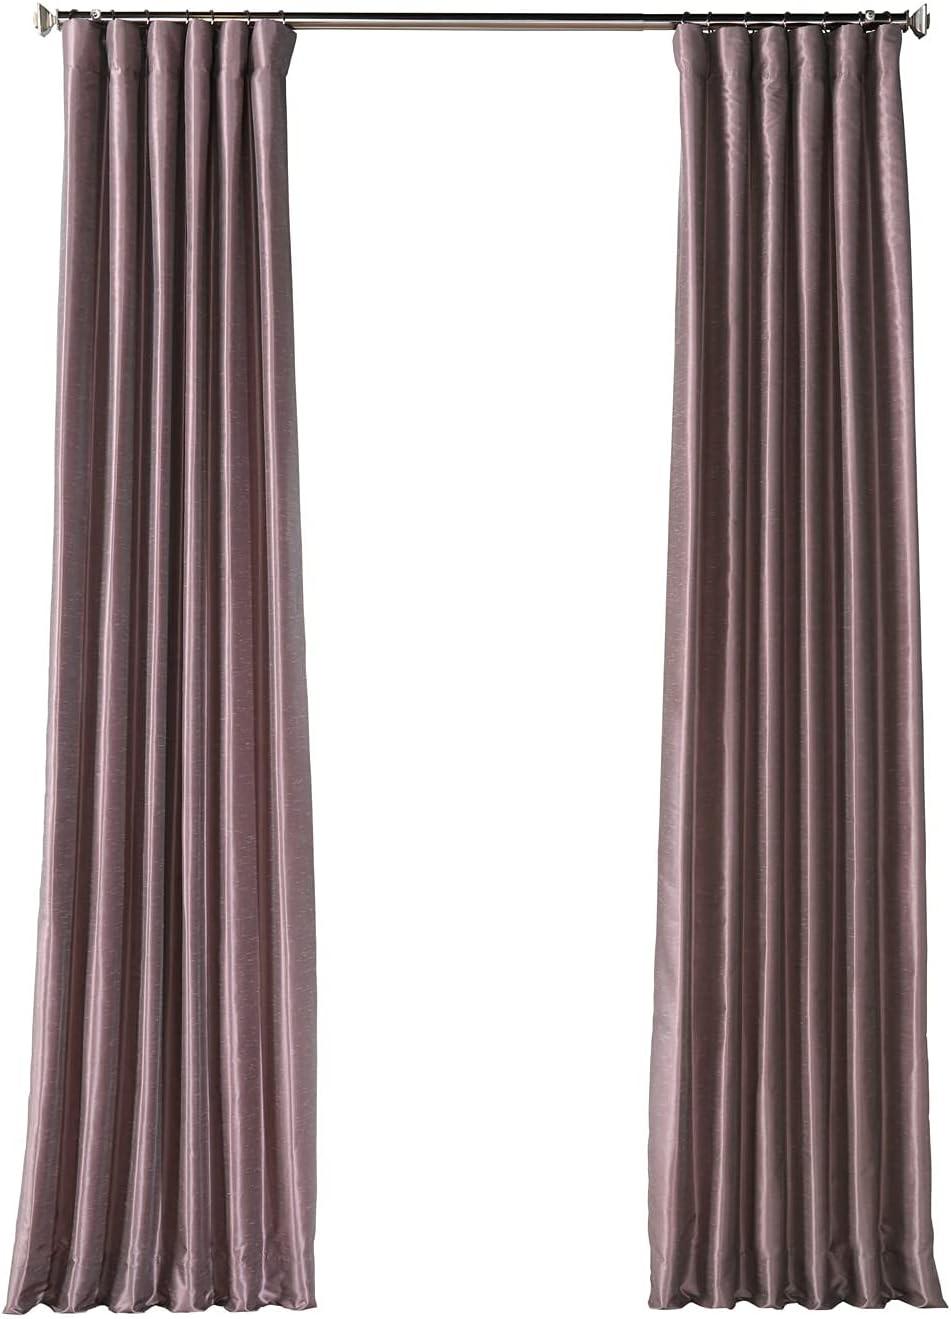 HPD Half Inexpensive Price Drapes Fresno Mall PDCH-KBS11BO-84 Blackout Vintage Textured